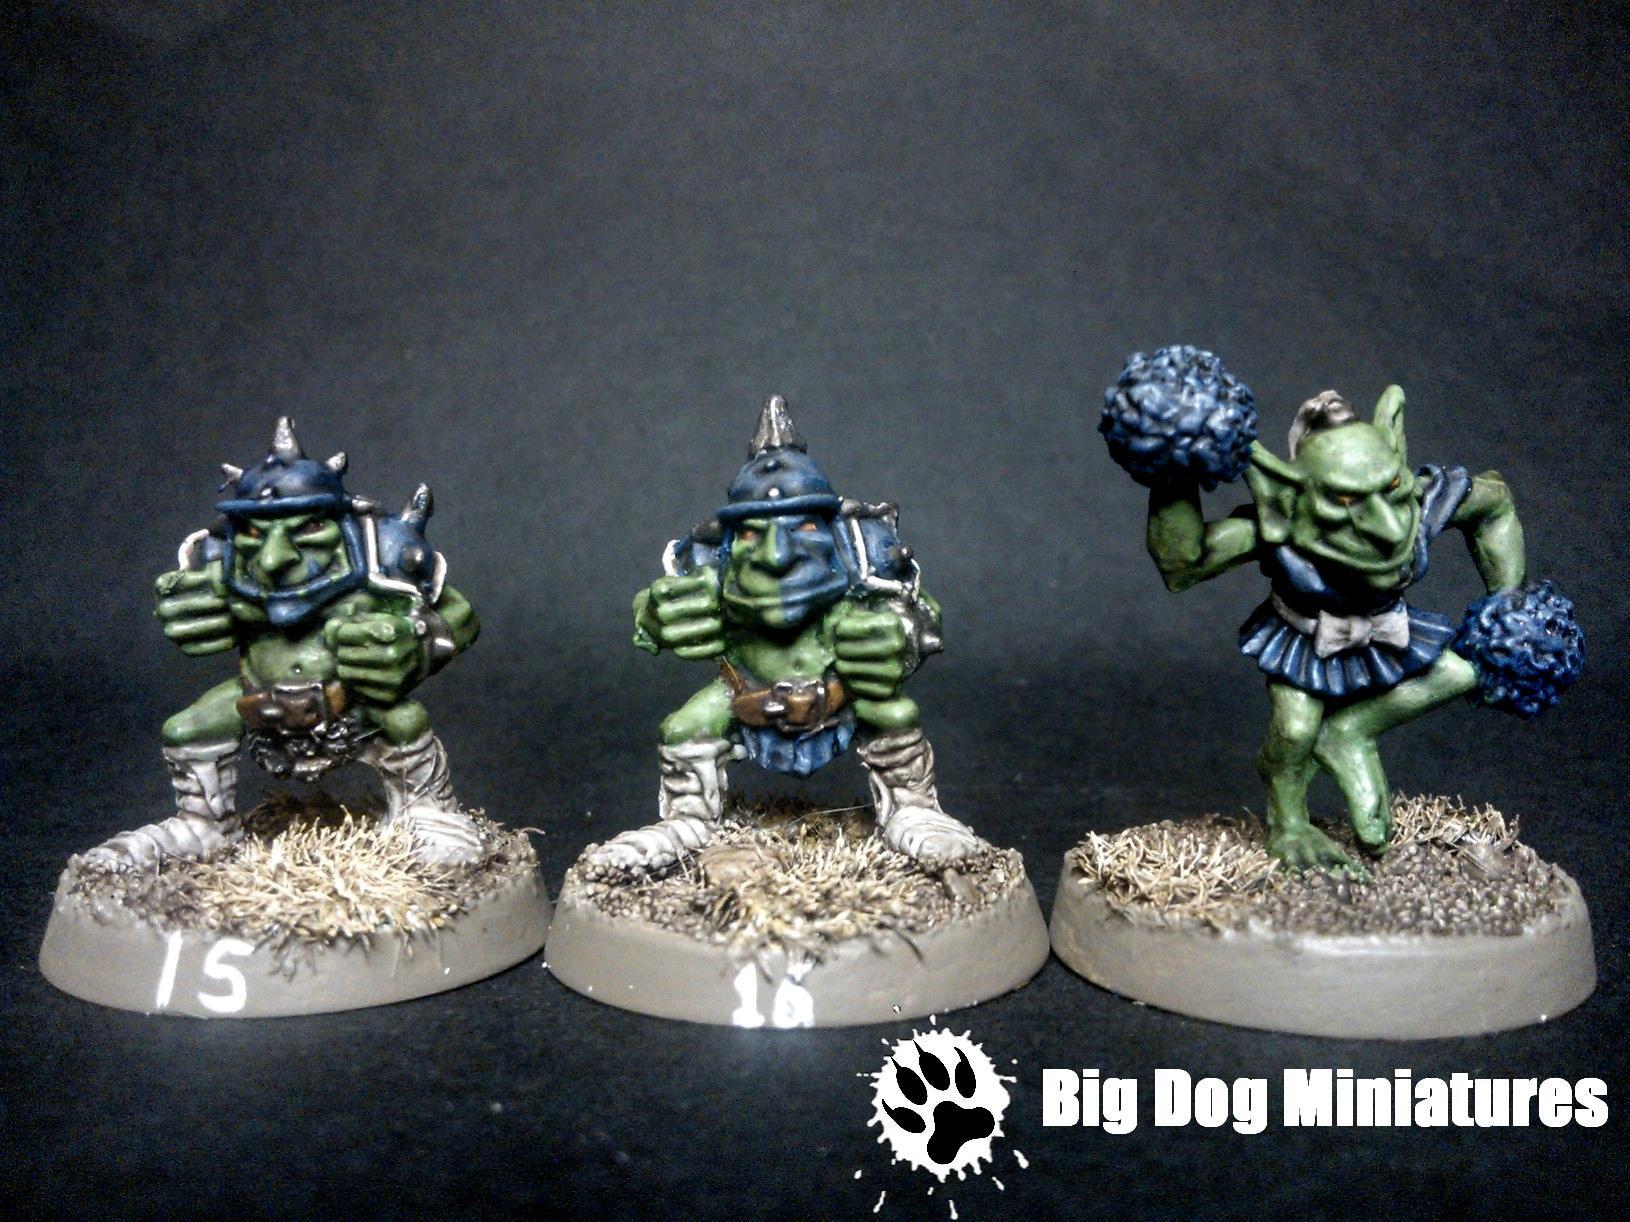 Big Dog Miniatures, Blood, Bowl, Cheerleader, Goblins, Troll